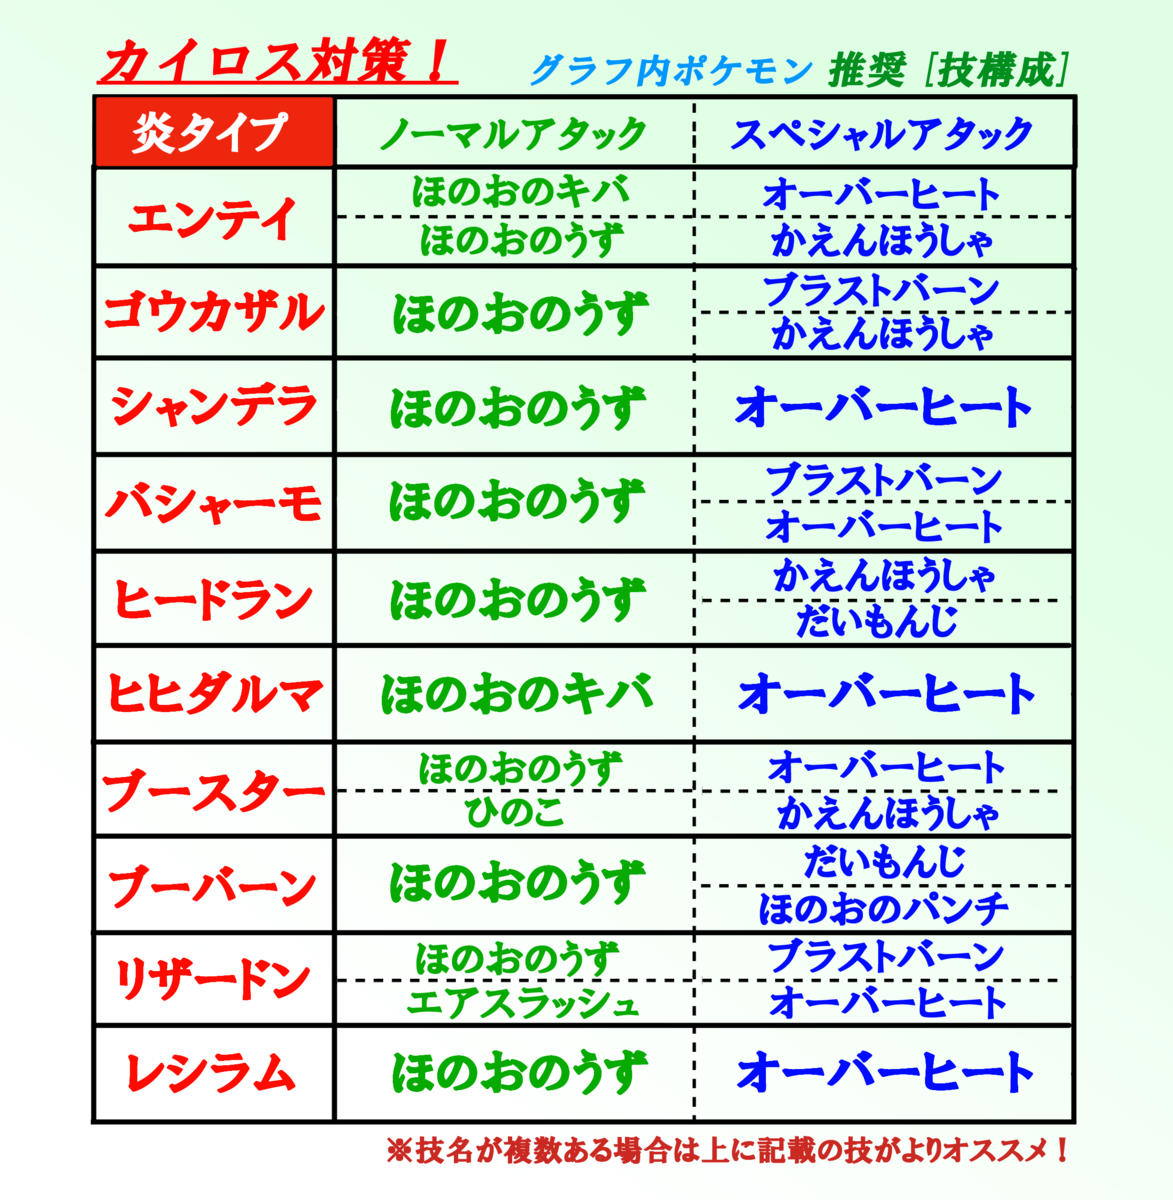 f:id:Kazumin0331:20200623121149p:plain